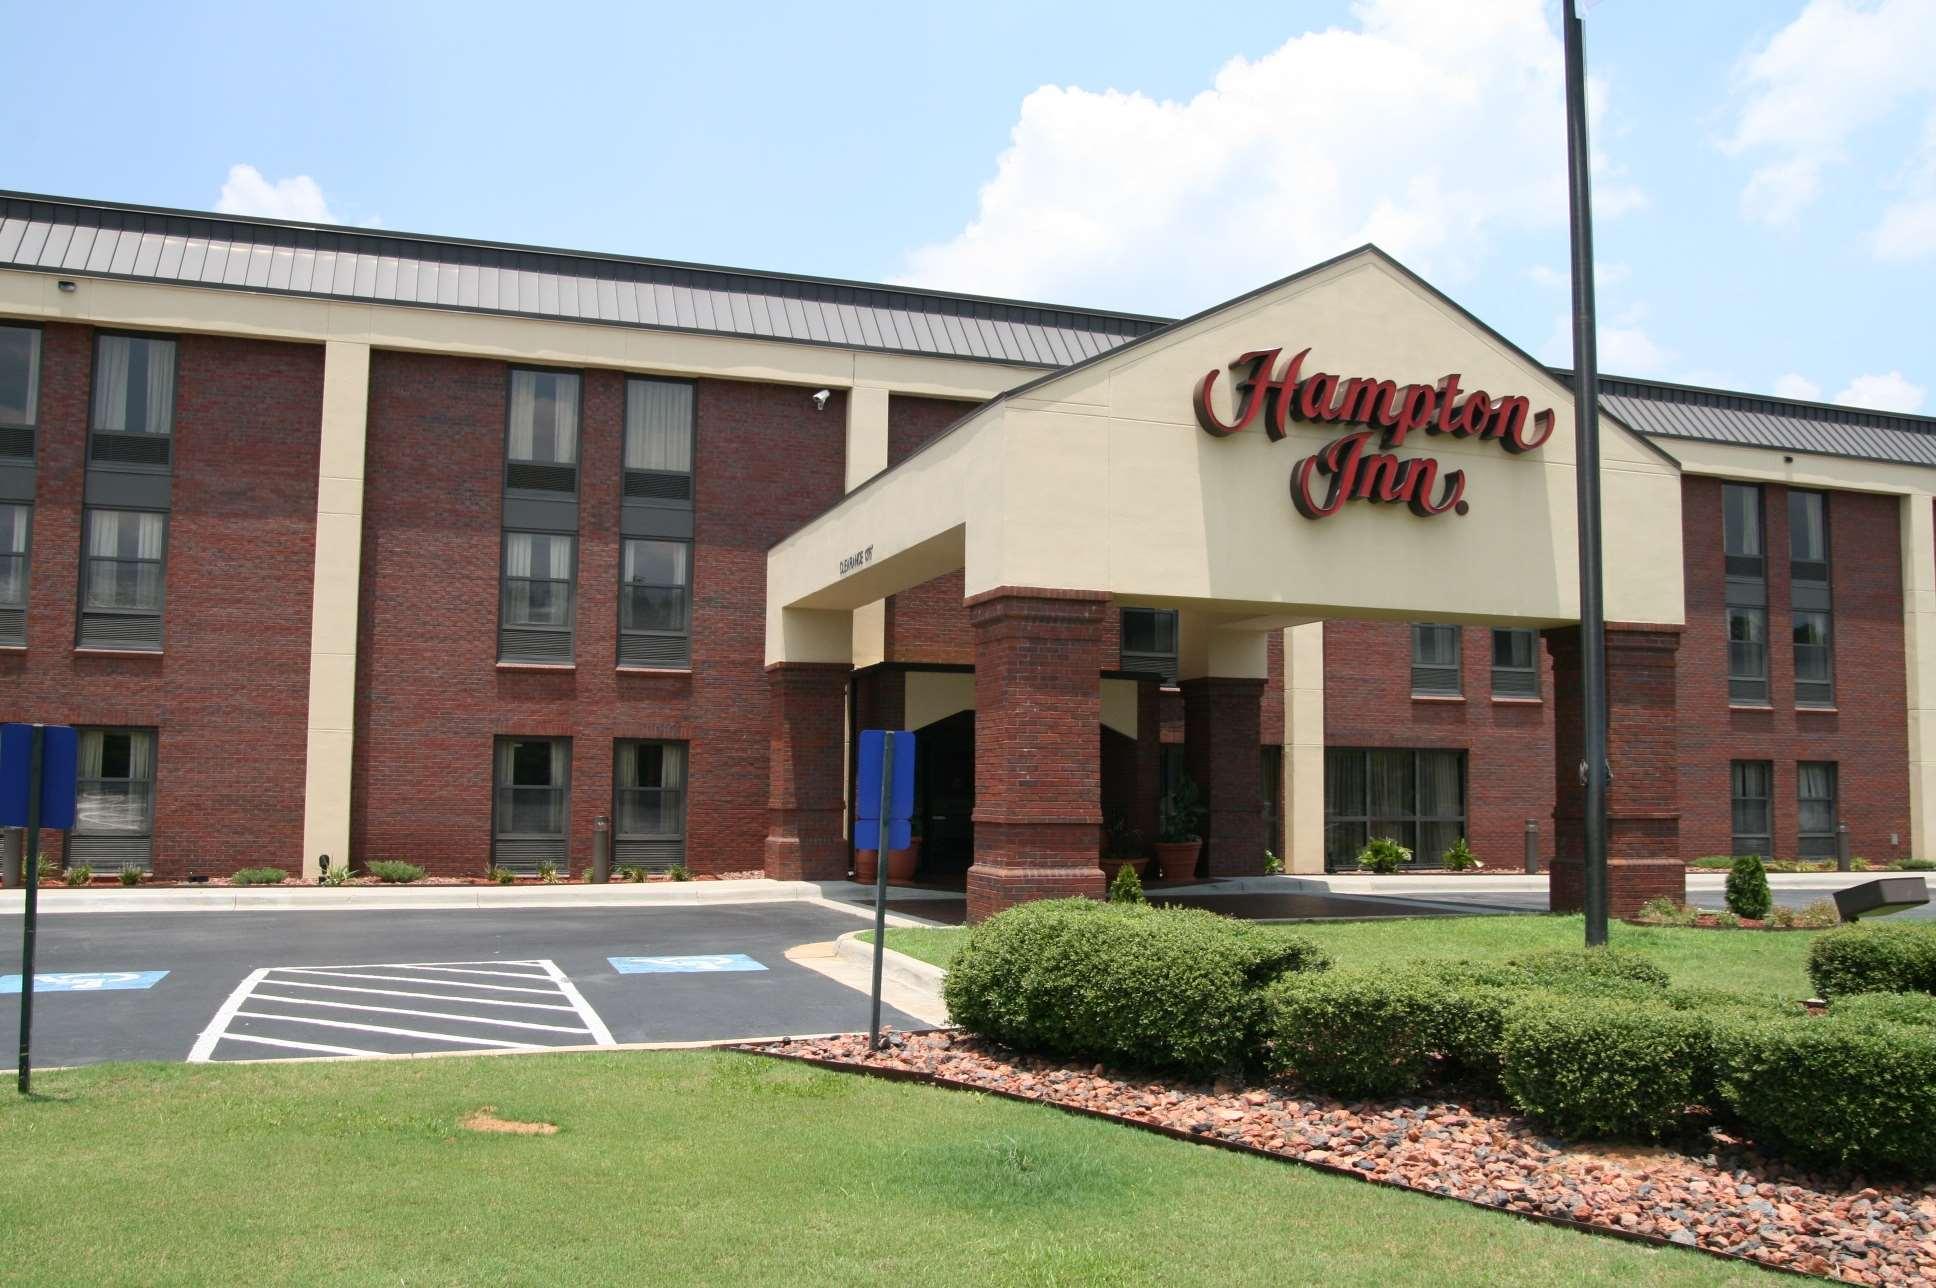 Hampton Inn Greenville image 0